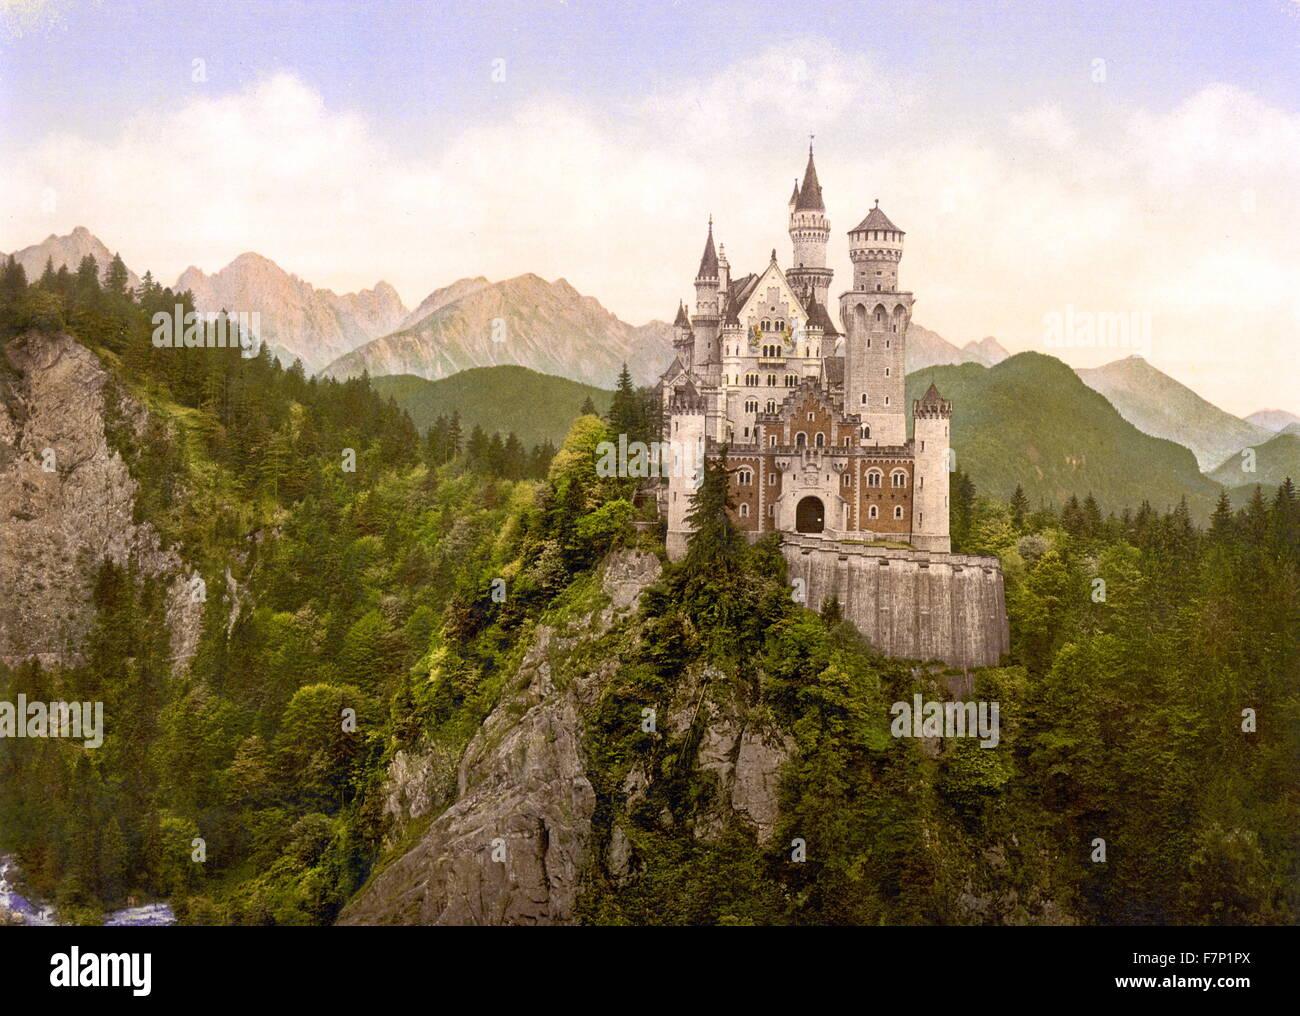 Neuschwanstein King Ludwig II castle, Upper Bavaria, Germany 1890 - Stock Image